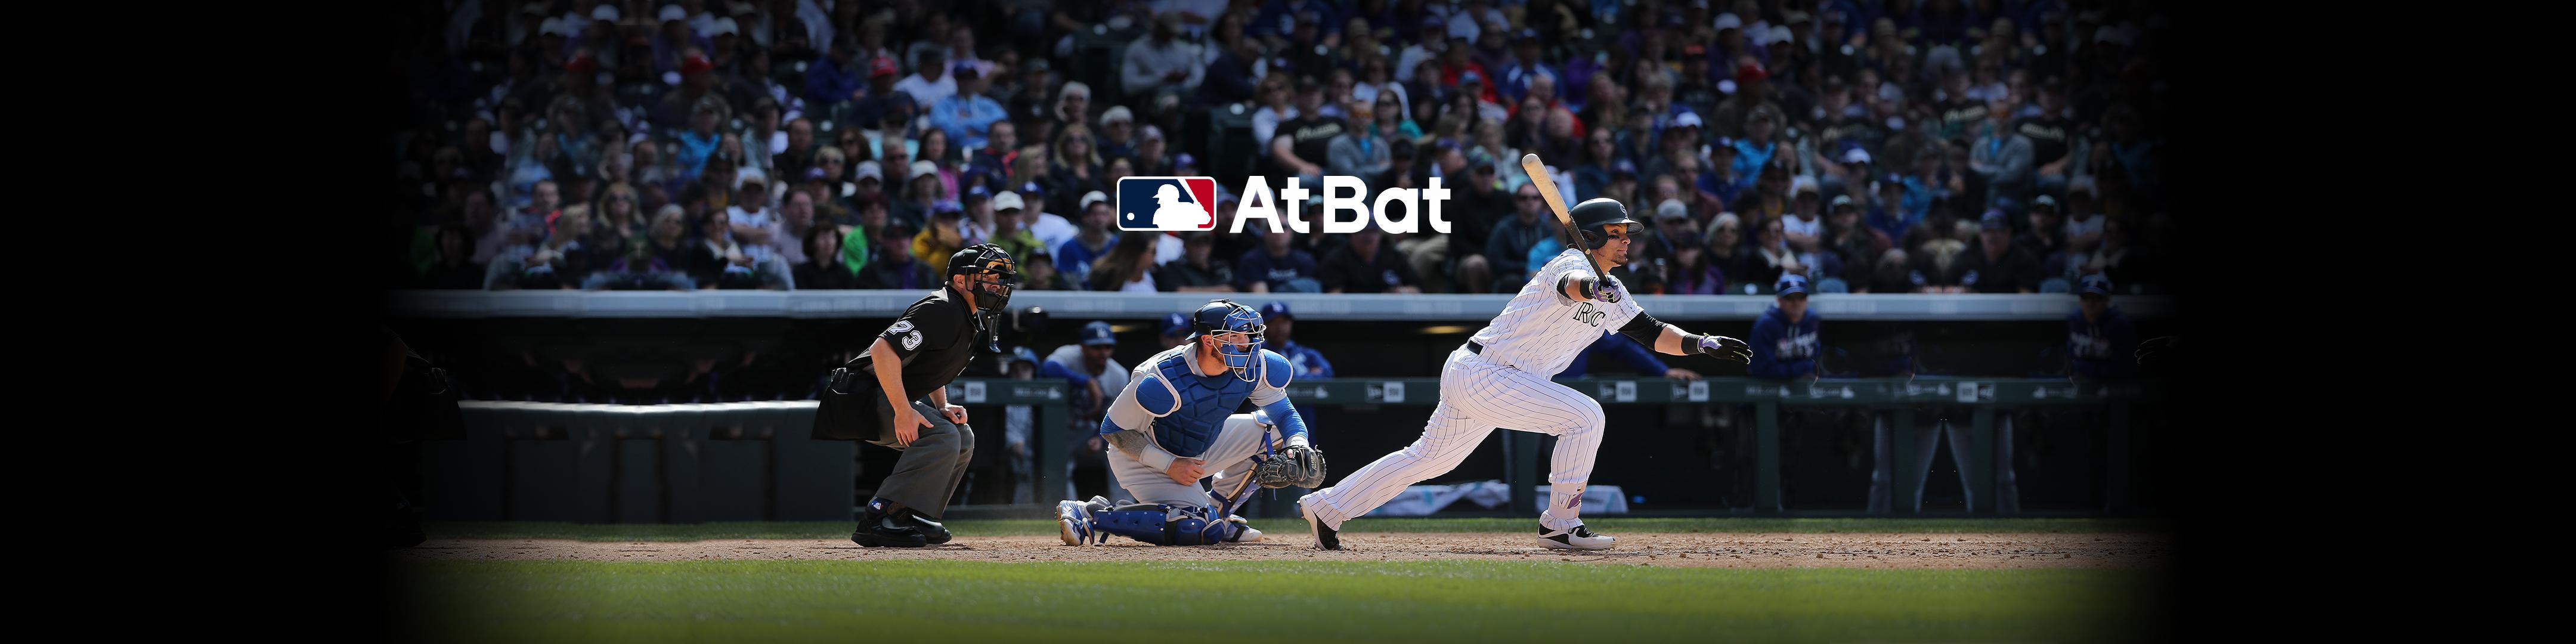 MLB At Bat - Revenue & Download estimates - Apple App Store